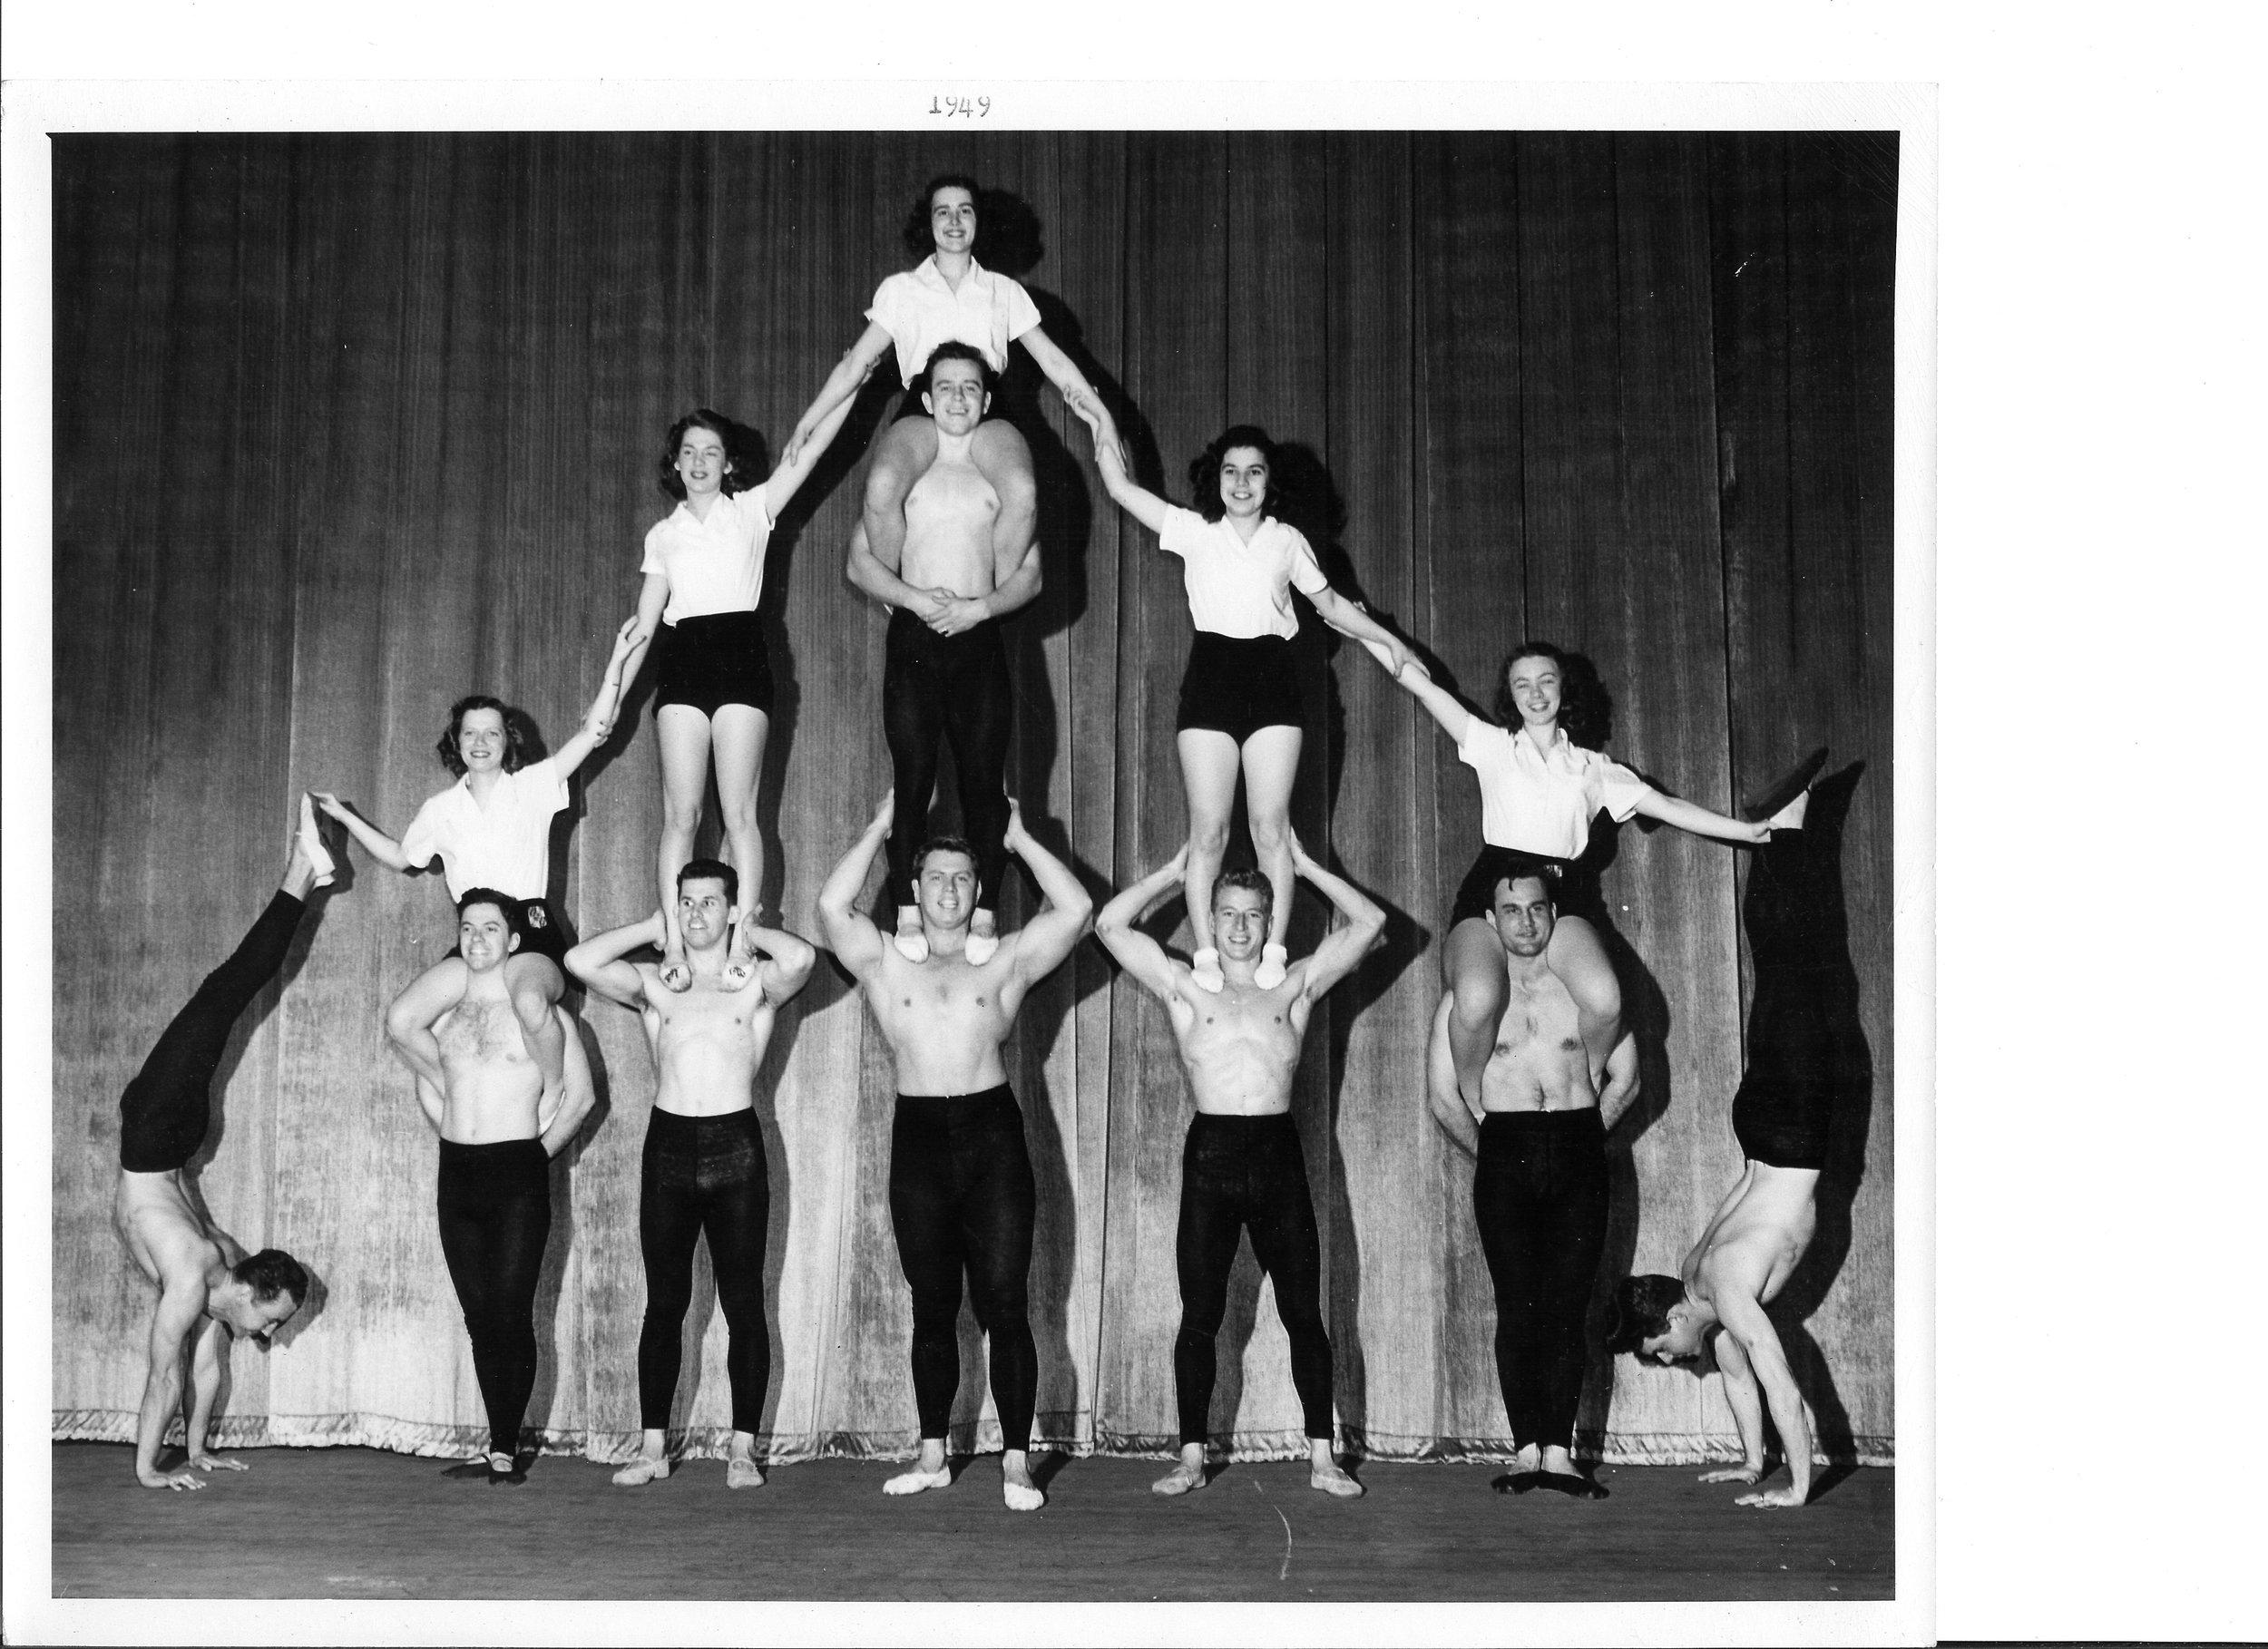 1949 Top l to r - Amy Berger, Joan Mitchell, Carol Hutson, Mary Adler and Betty Richter  Bottom l to r - Win Oppegard, Chuck Fox, Bill Foland, Bill Harris, George Sorg....jpg